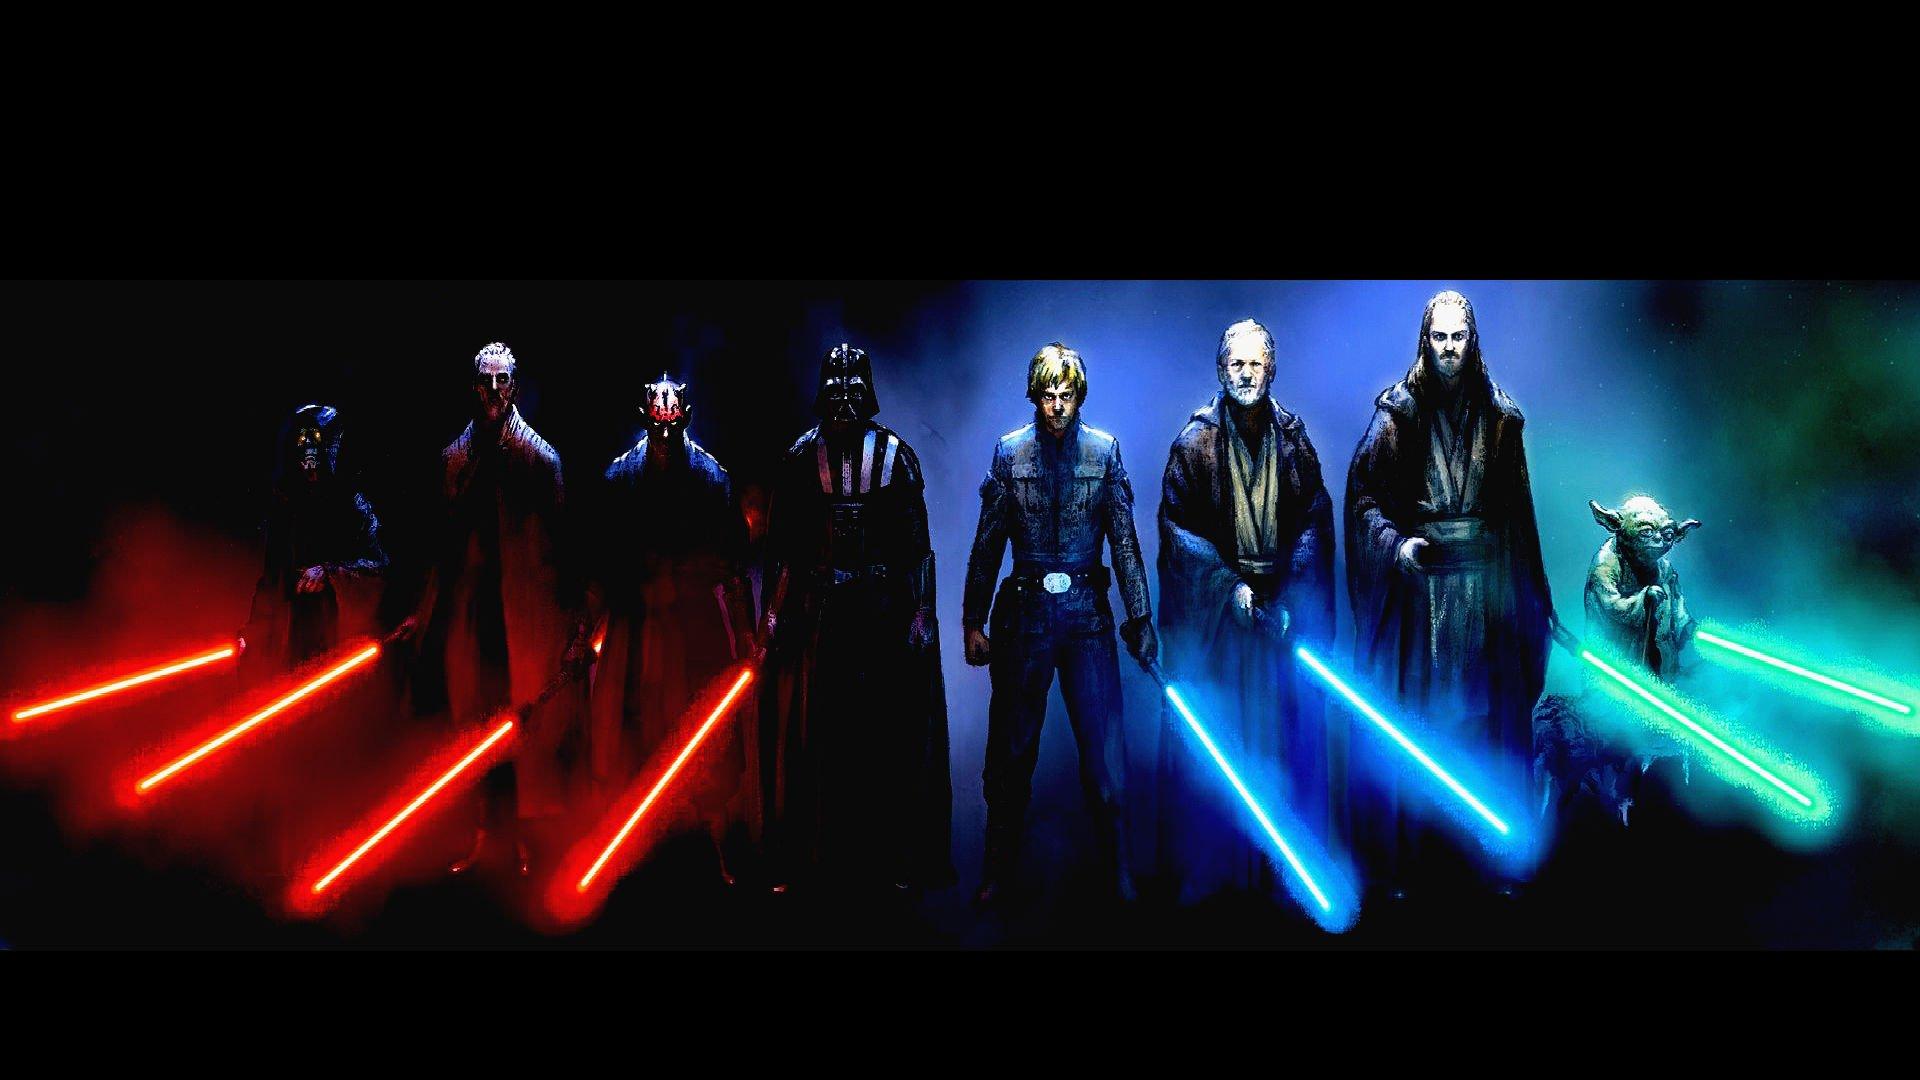 Star Wars Force Awakens 1080p: Force Awakens Desktop Wallpaper